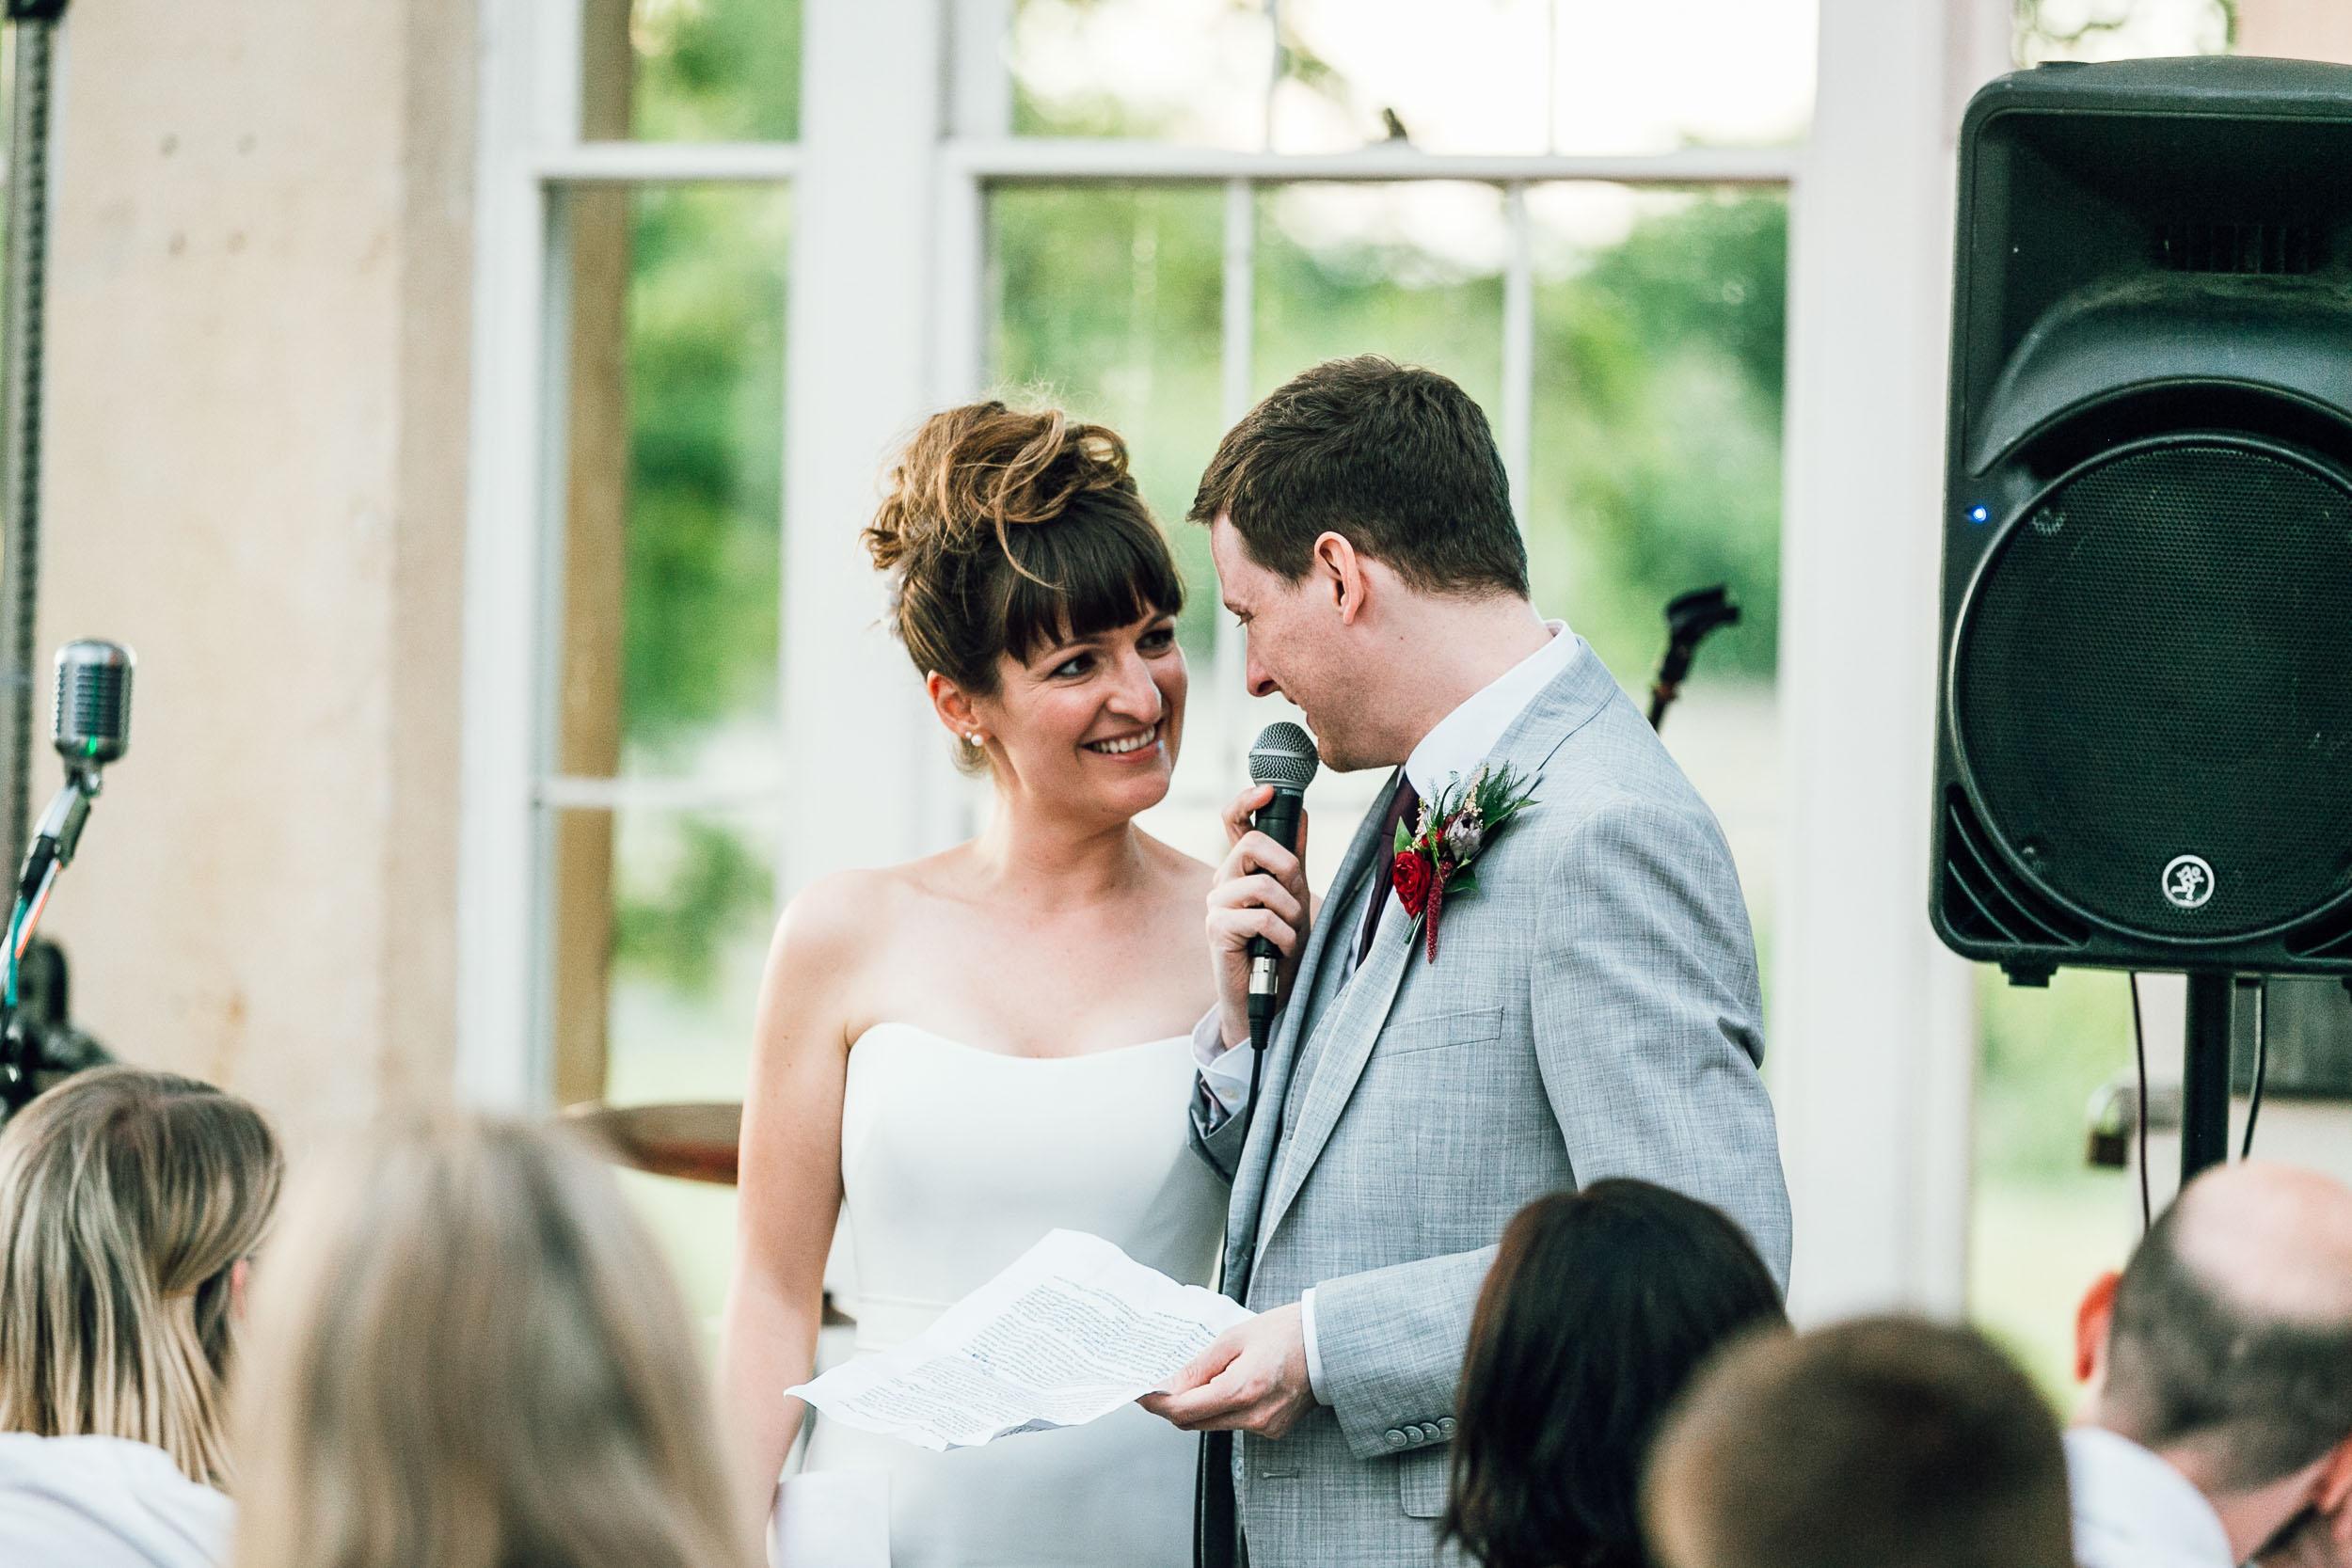 syon-house-wedding-photographer-london 150.jpg